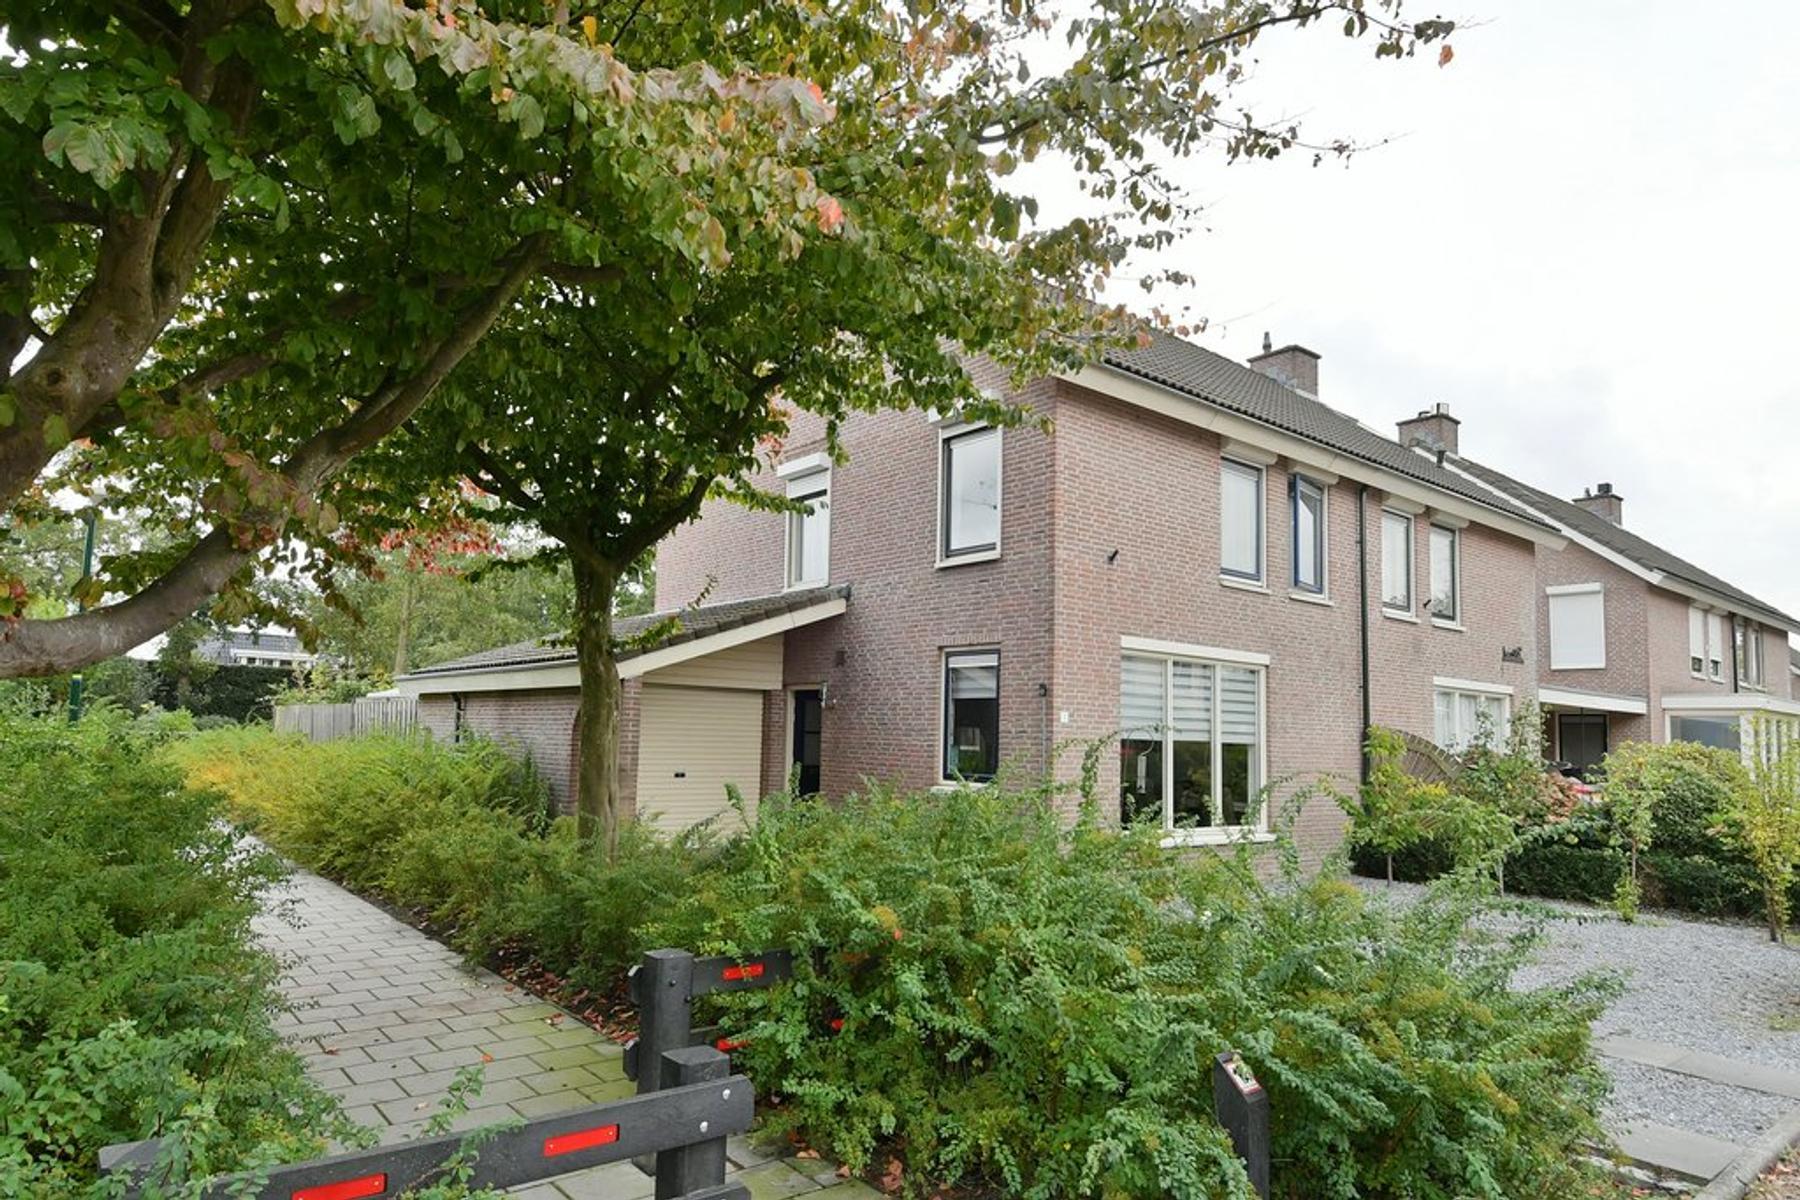 Honingbij 1 in Soest 3766 JC